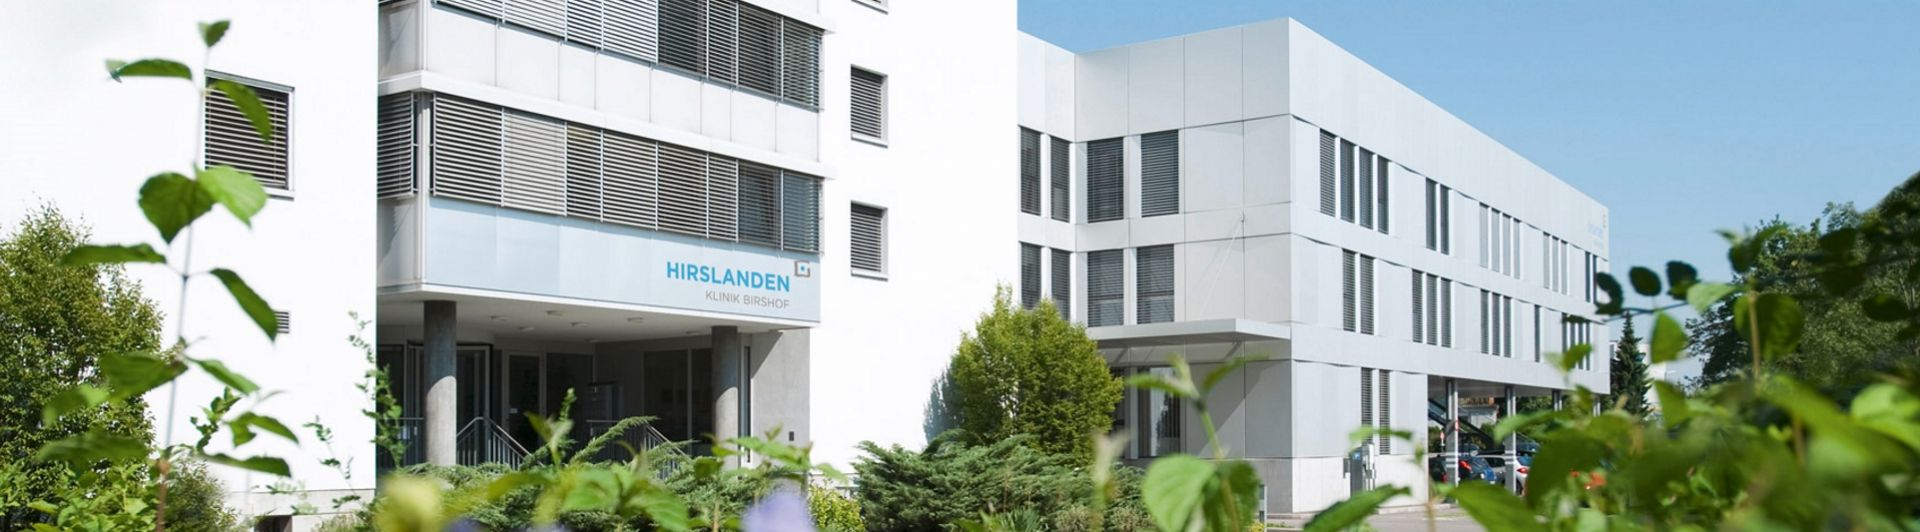 Hirslanden Klinik Birshof, Münchenstein Basel